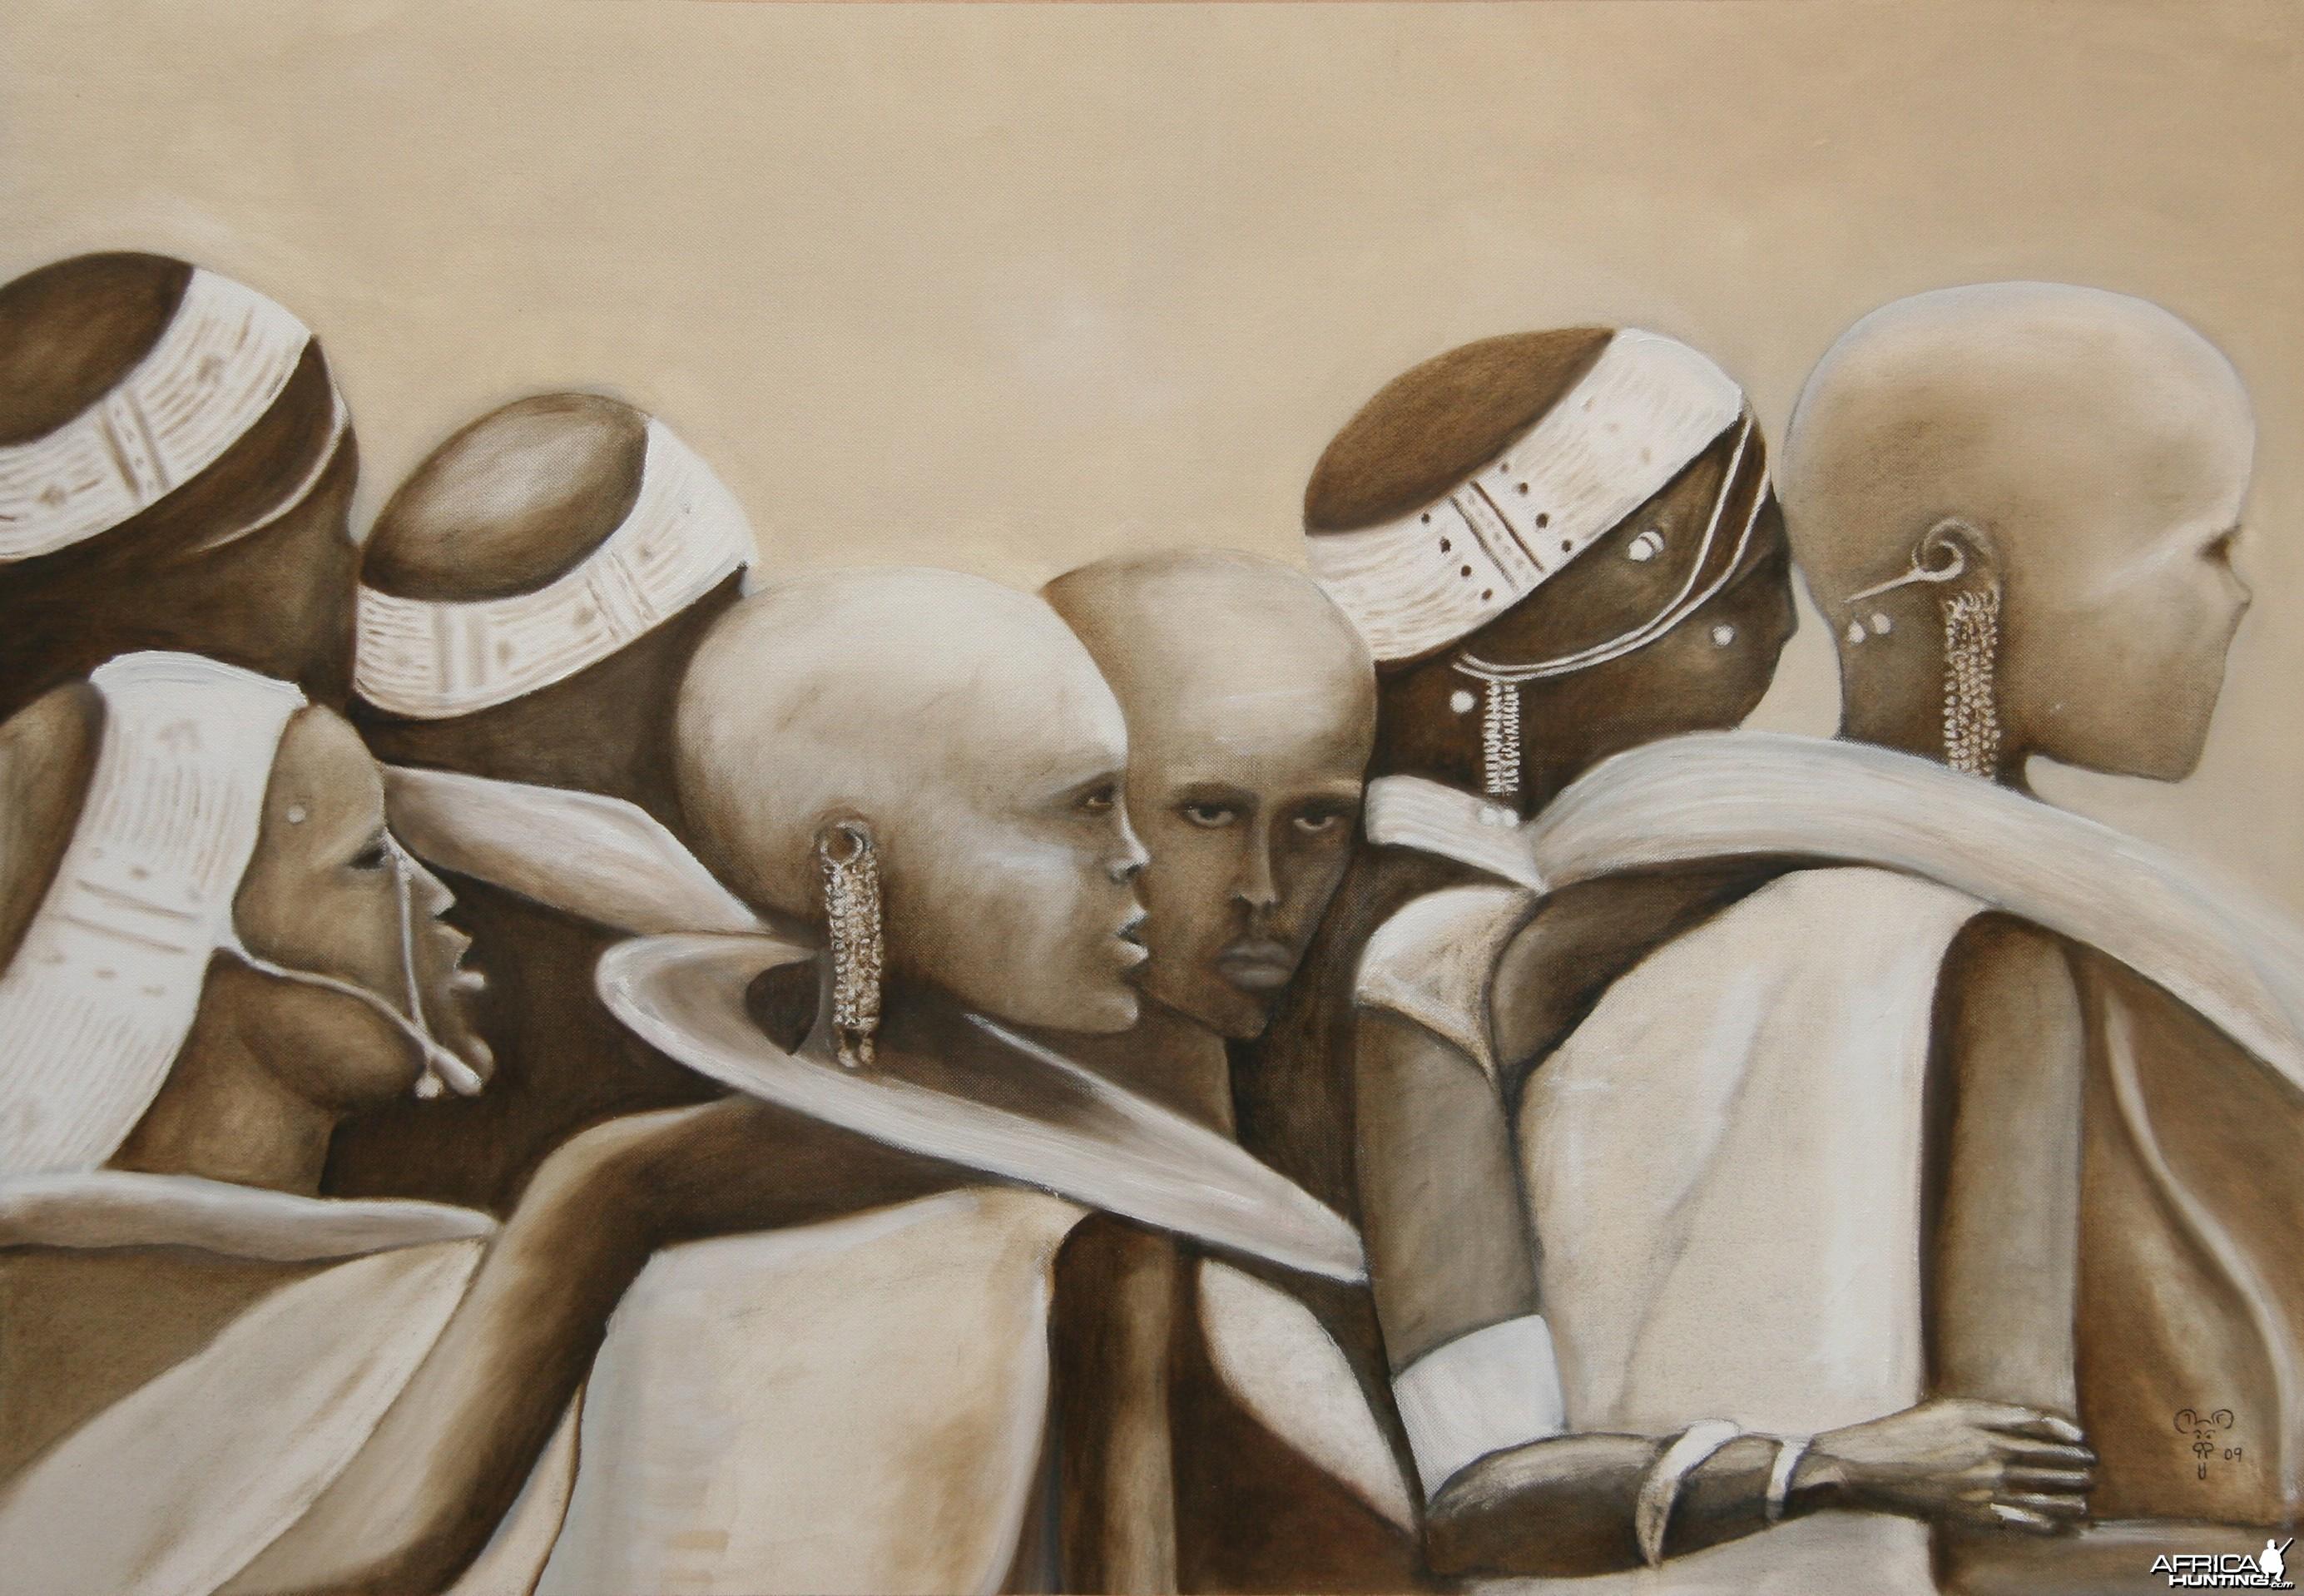 Sikulu les Ditos by Franck Maes